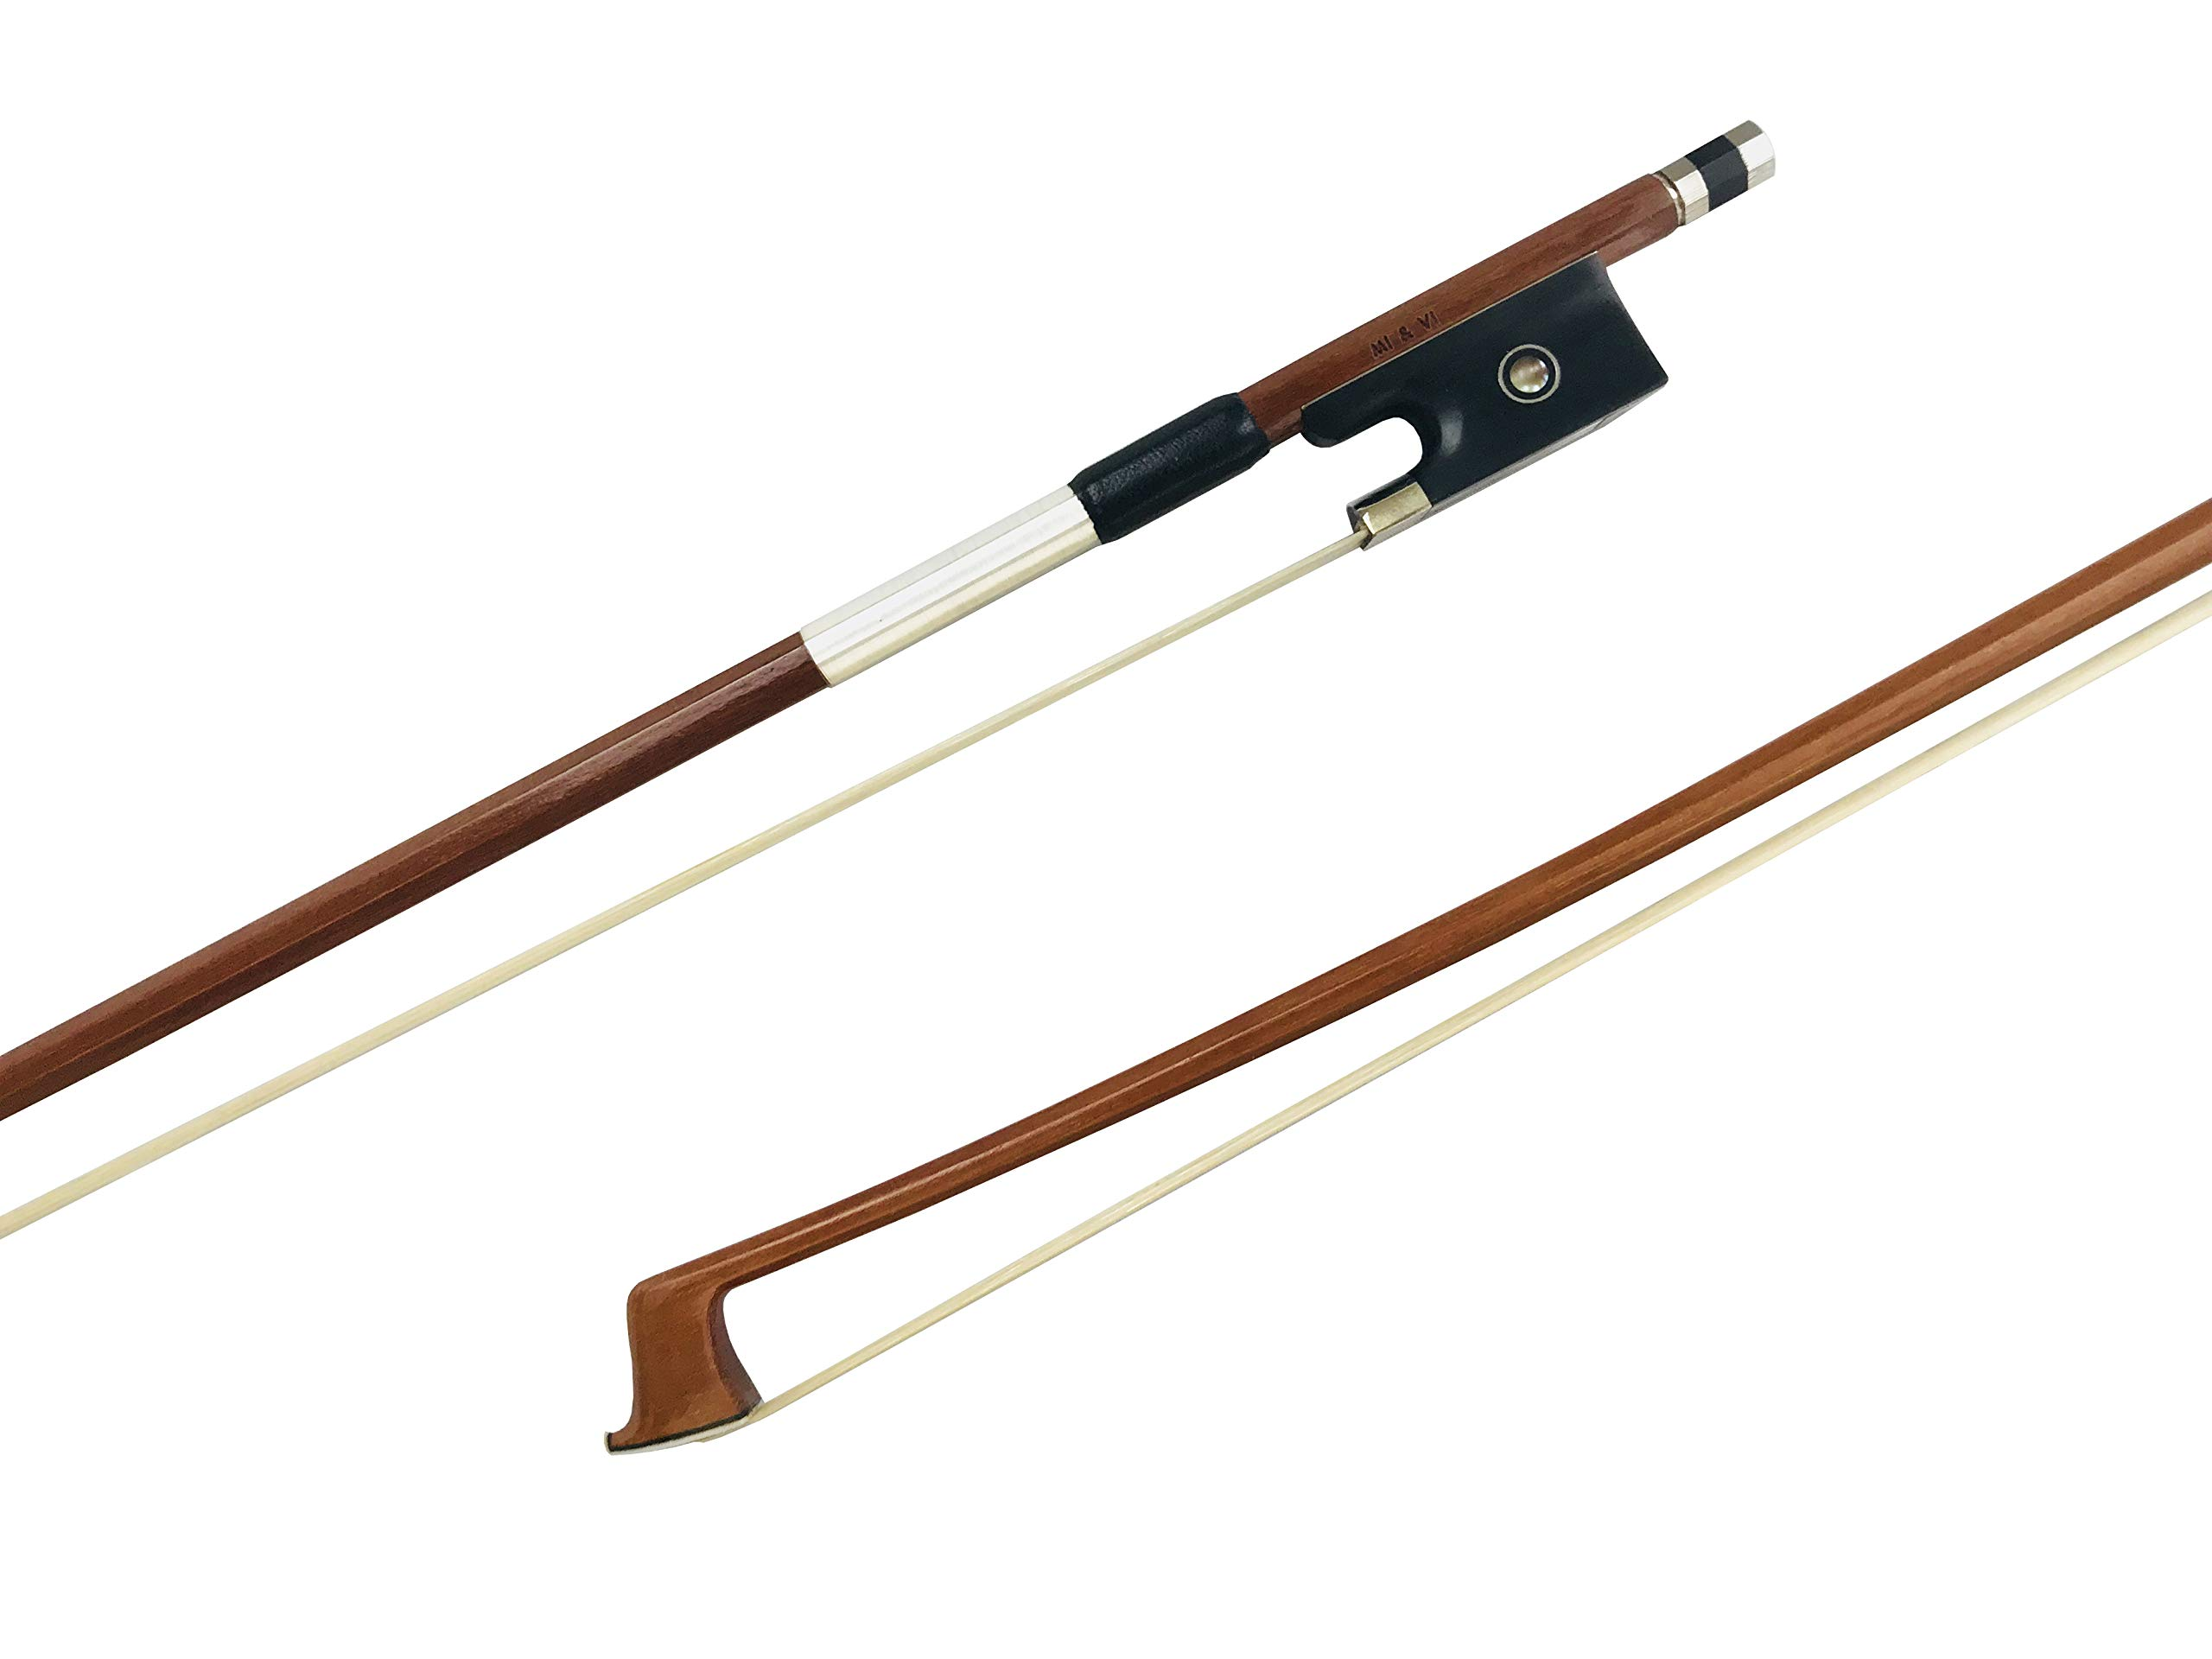 MI&VI Basic Pernambuco Violin Bow w/Ebony Frog, Octagonal Silver Mounted Nickel Stick (Violin 1/4)